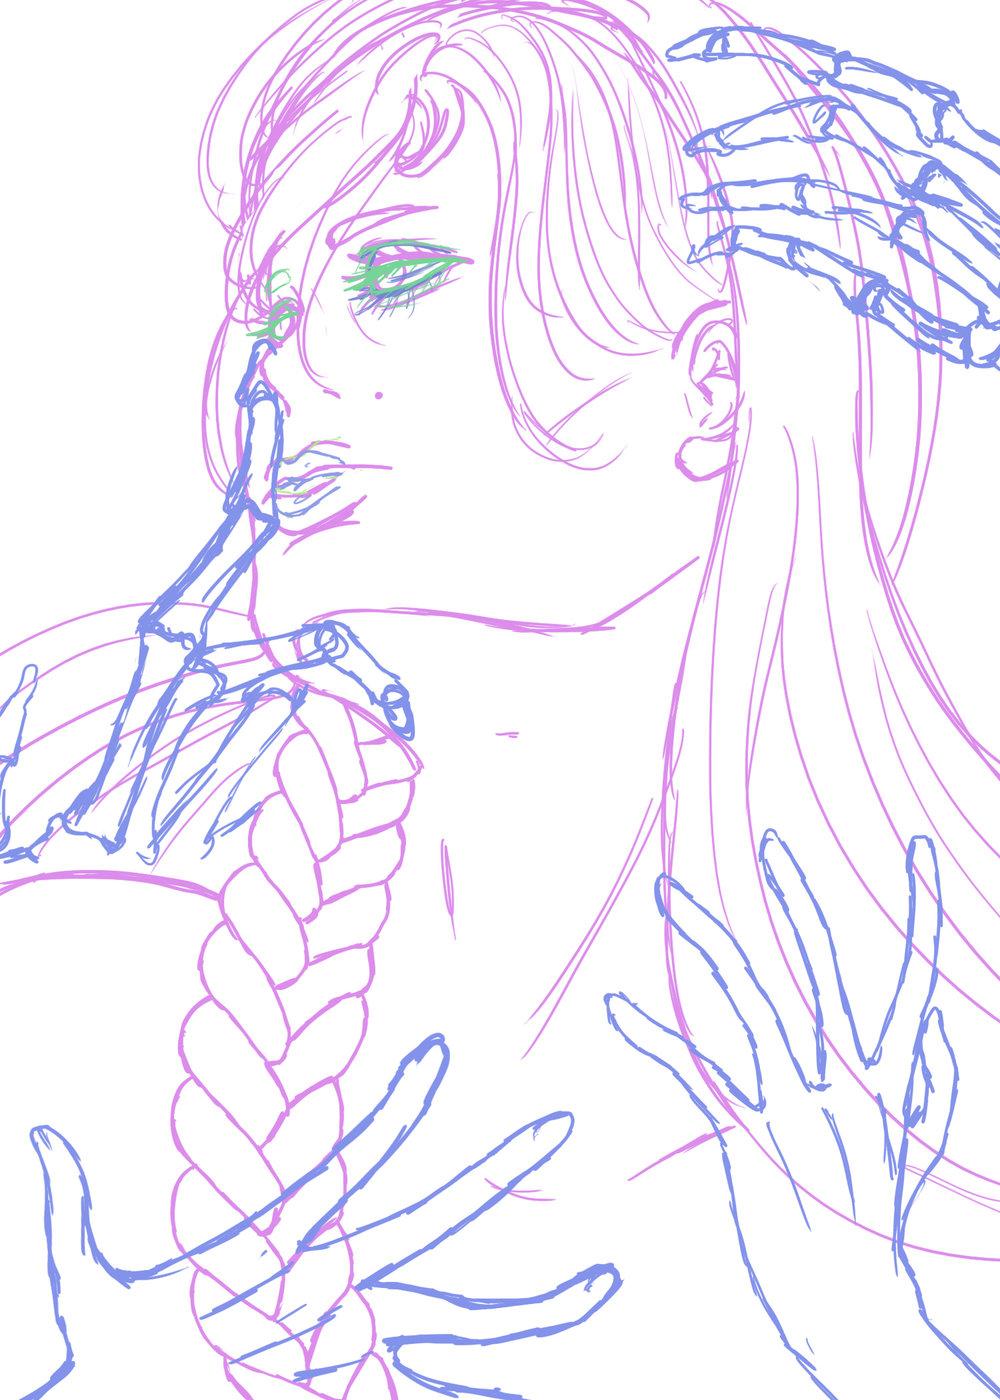 Art-Nouveau-Pastel-Gore-Sketch-3.jpg